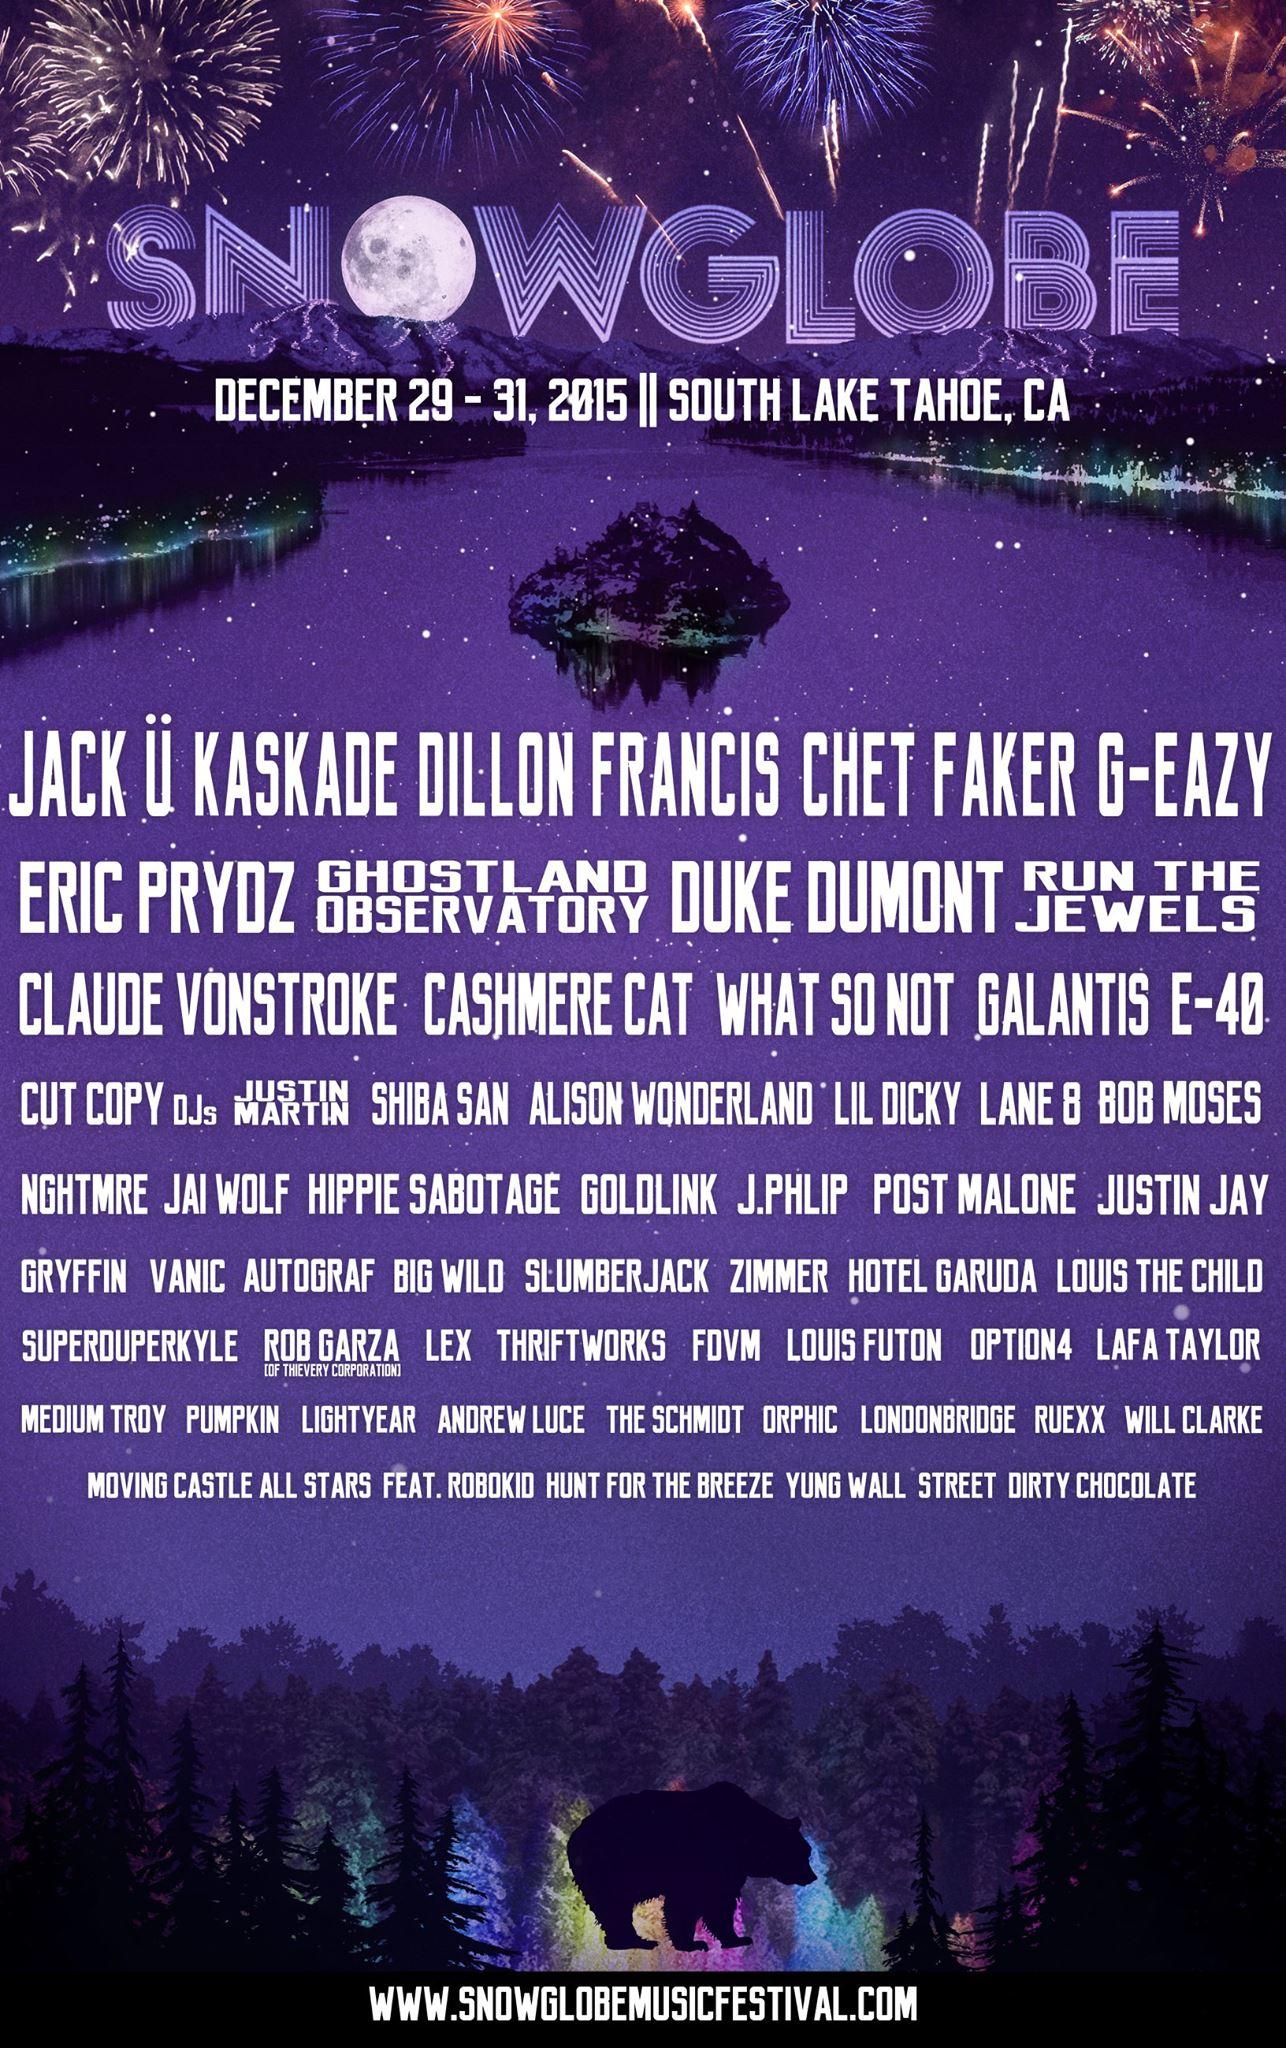 Winter EDM Festivals